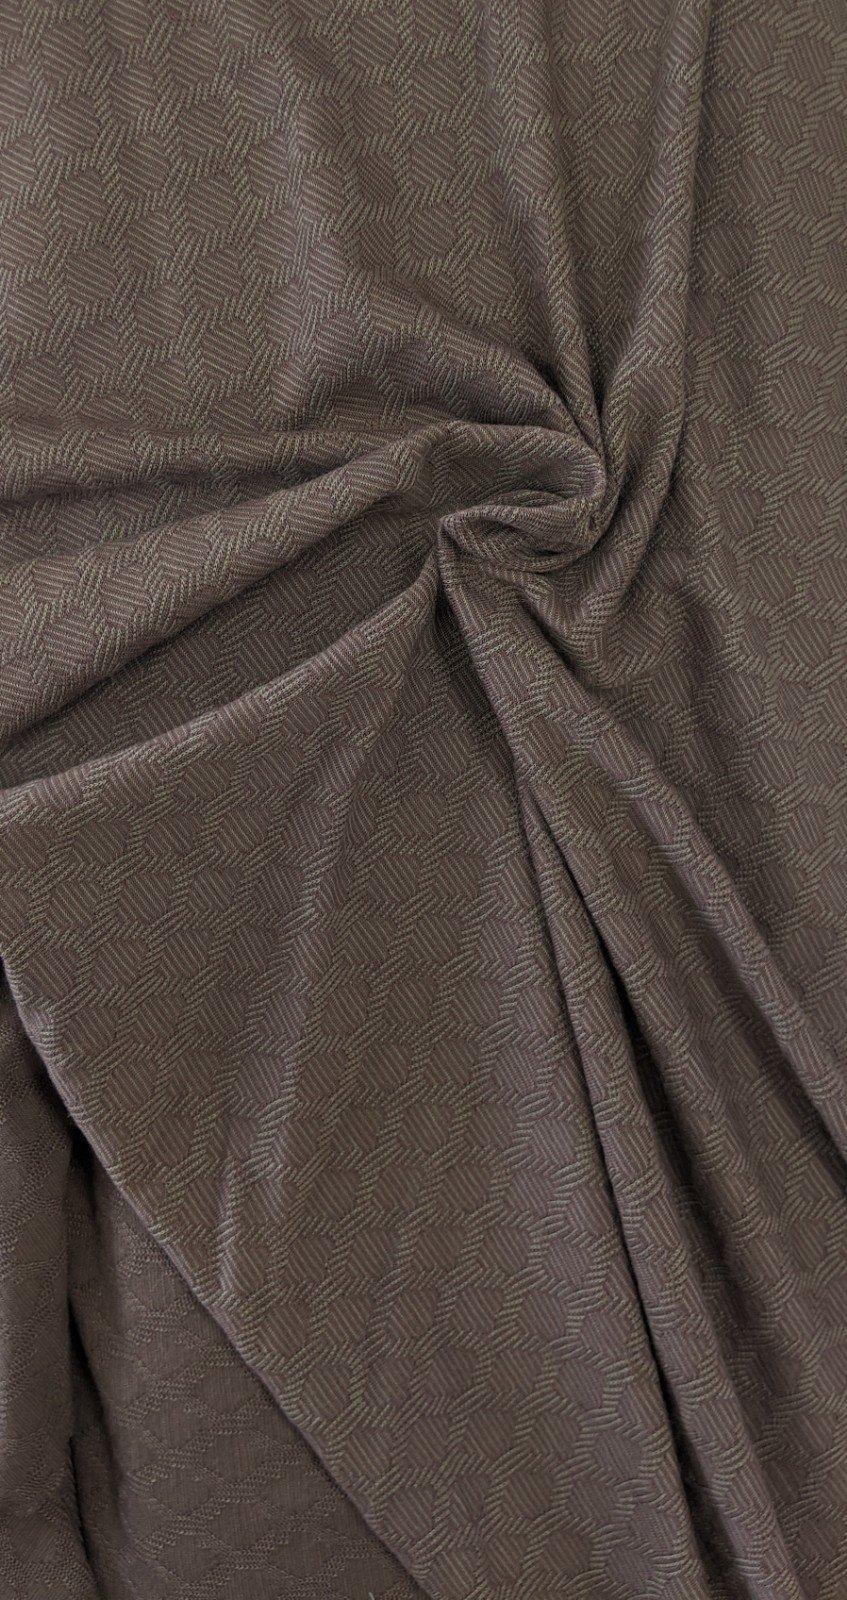 Honeycomb Jacqaurd Knit